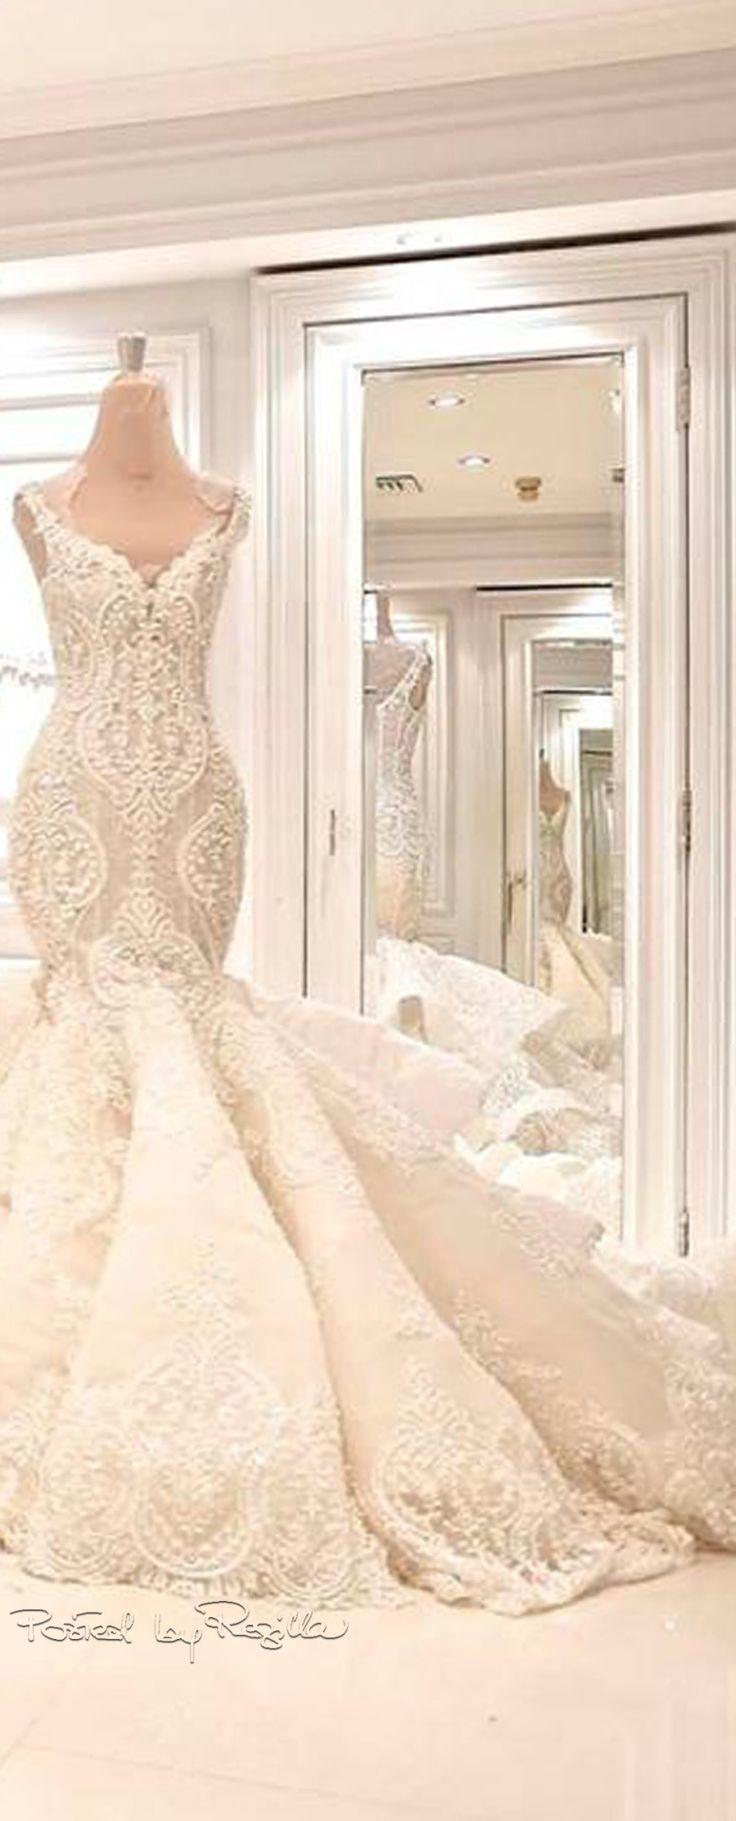 1000 images about weddings wedding dresses on pinterest for Jacy kay wedding dress